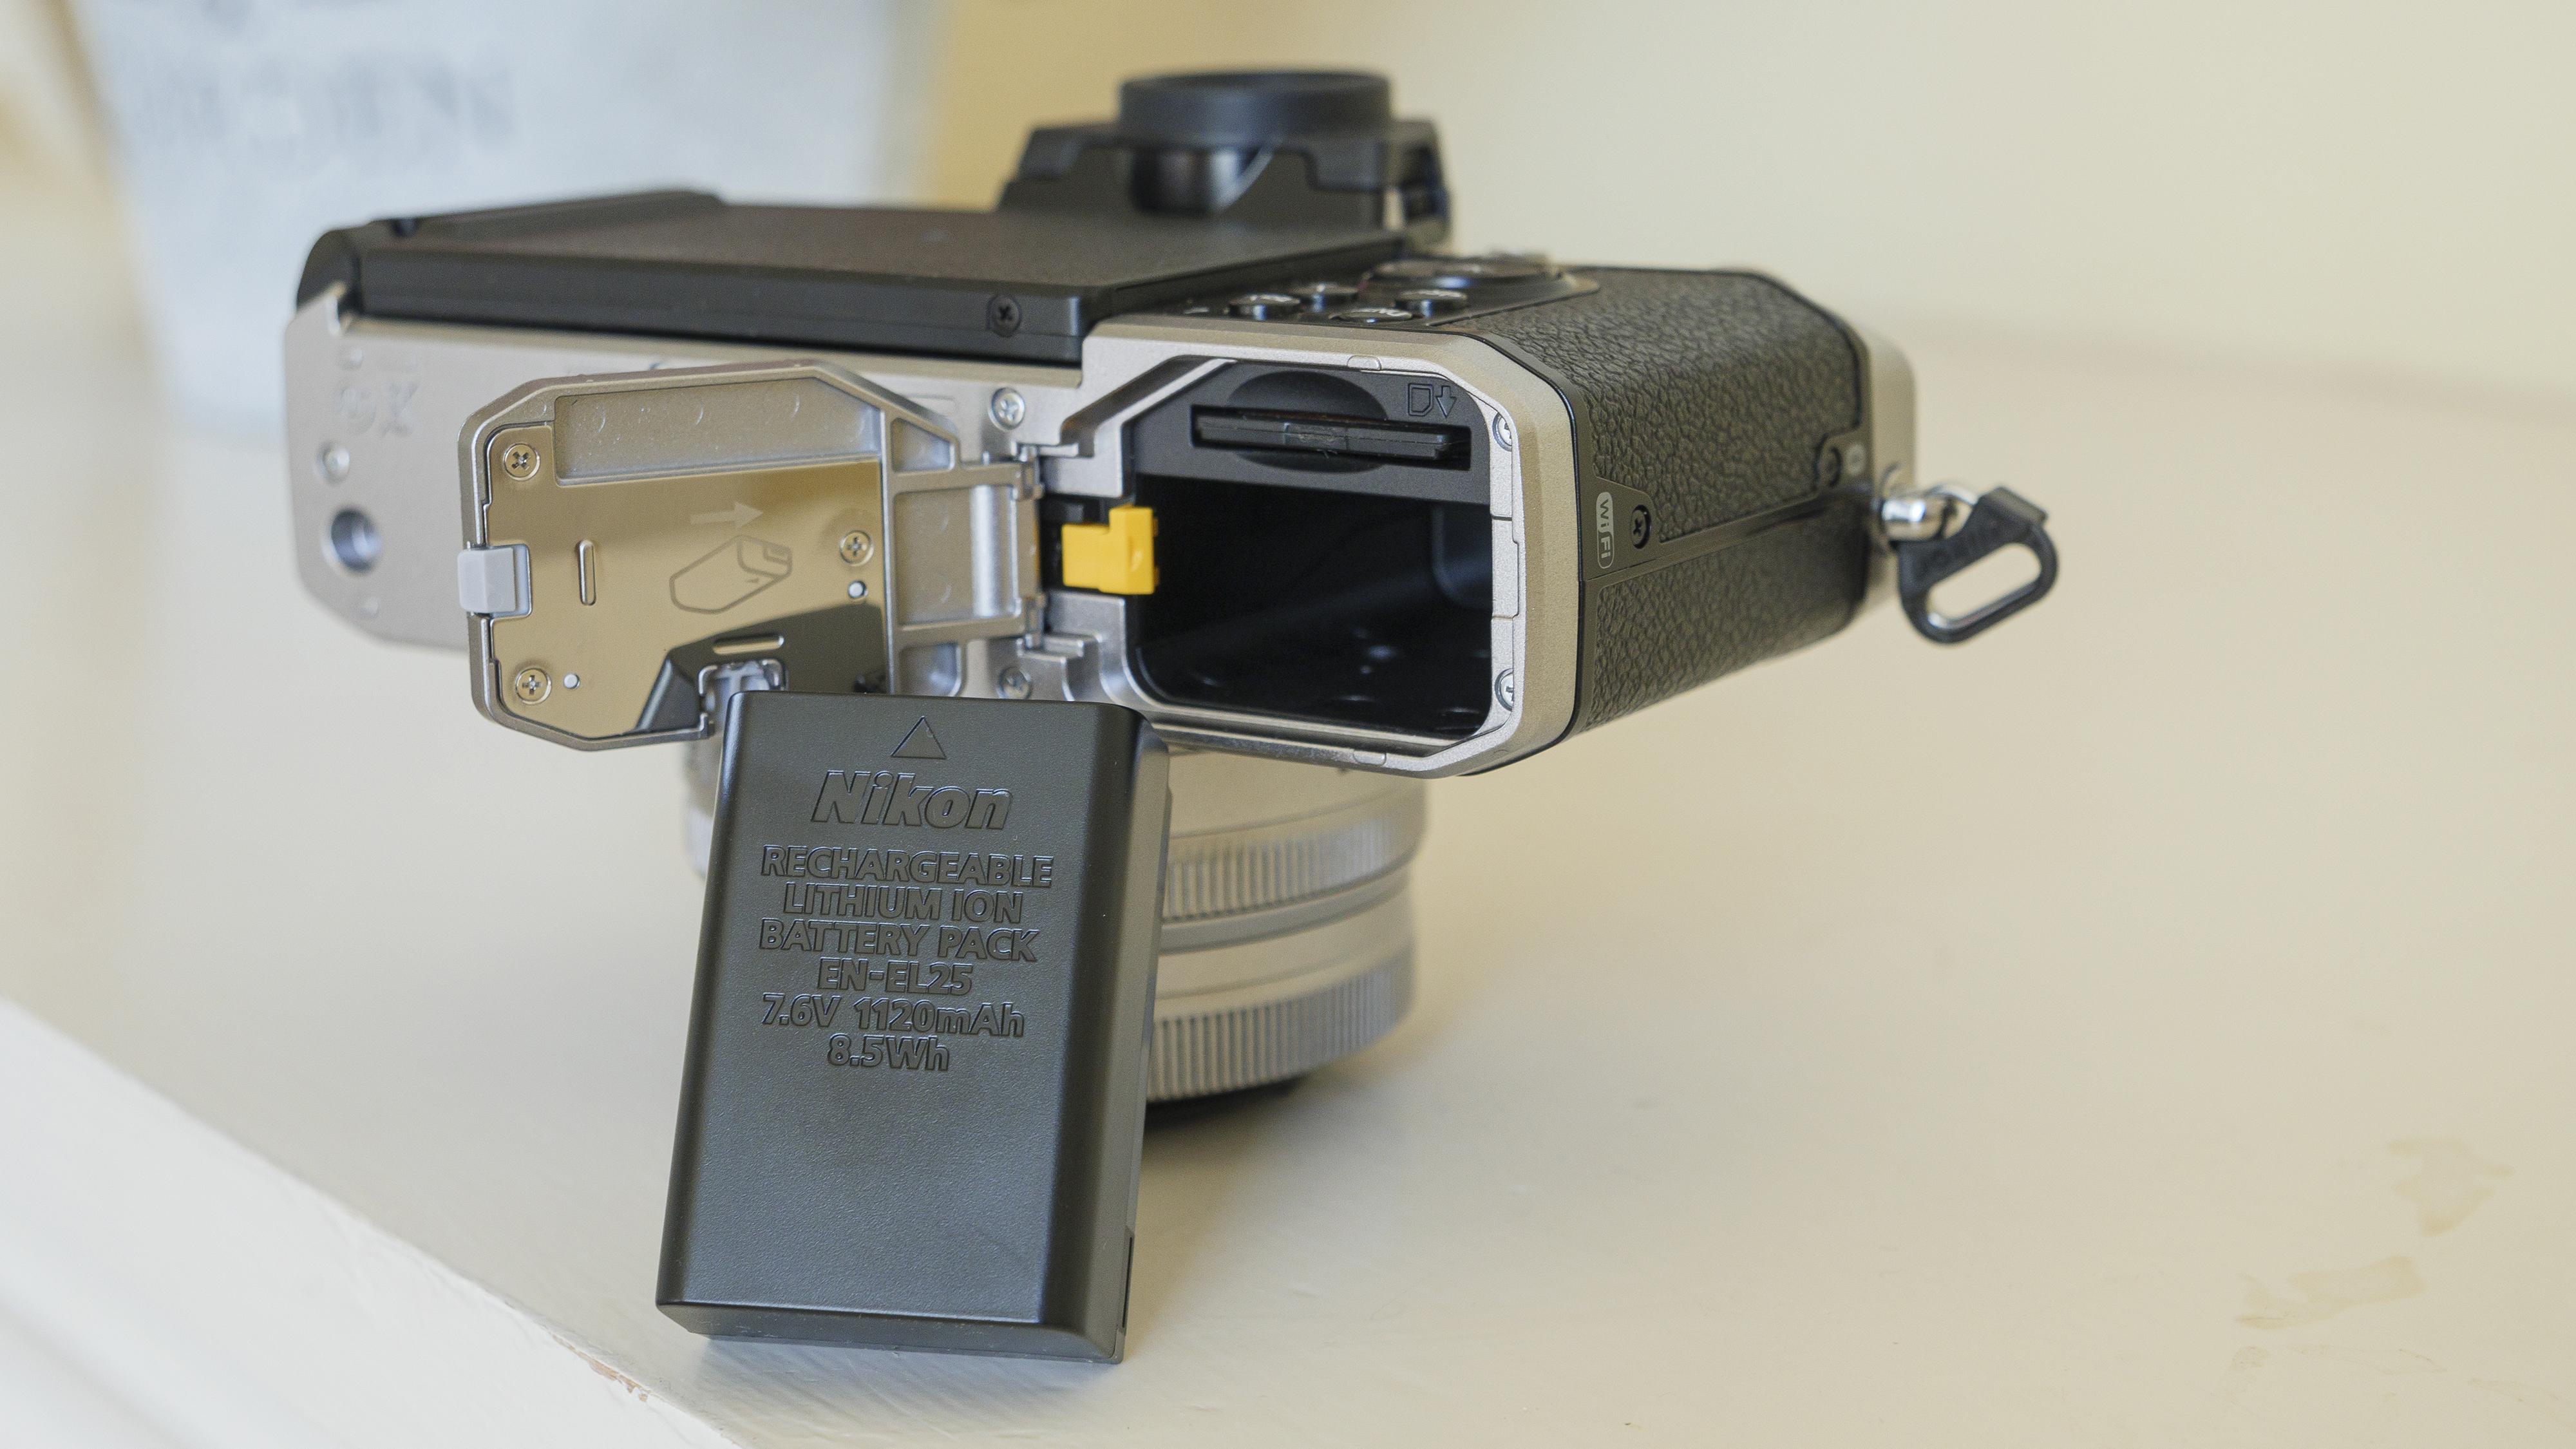 The battery of the Nikon Z fc camera